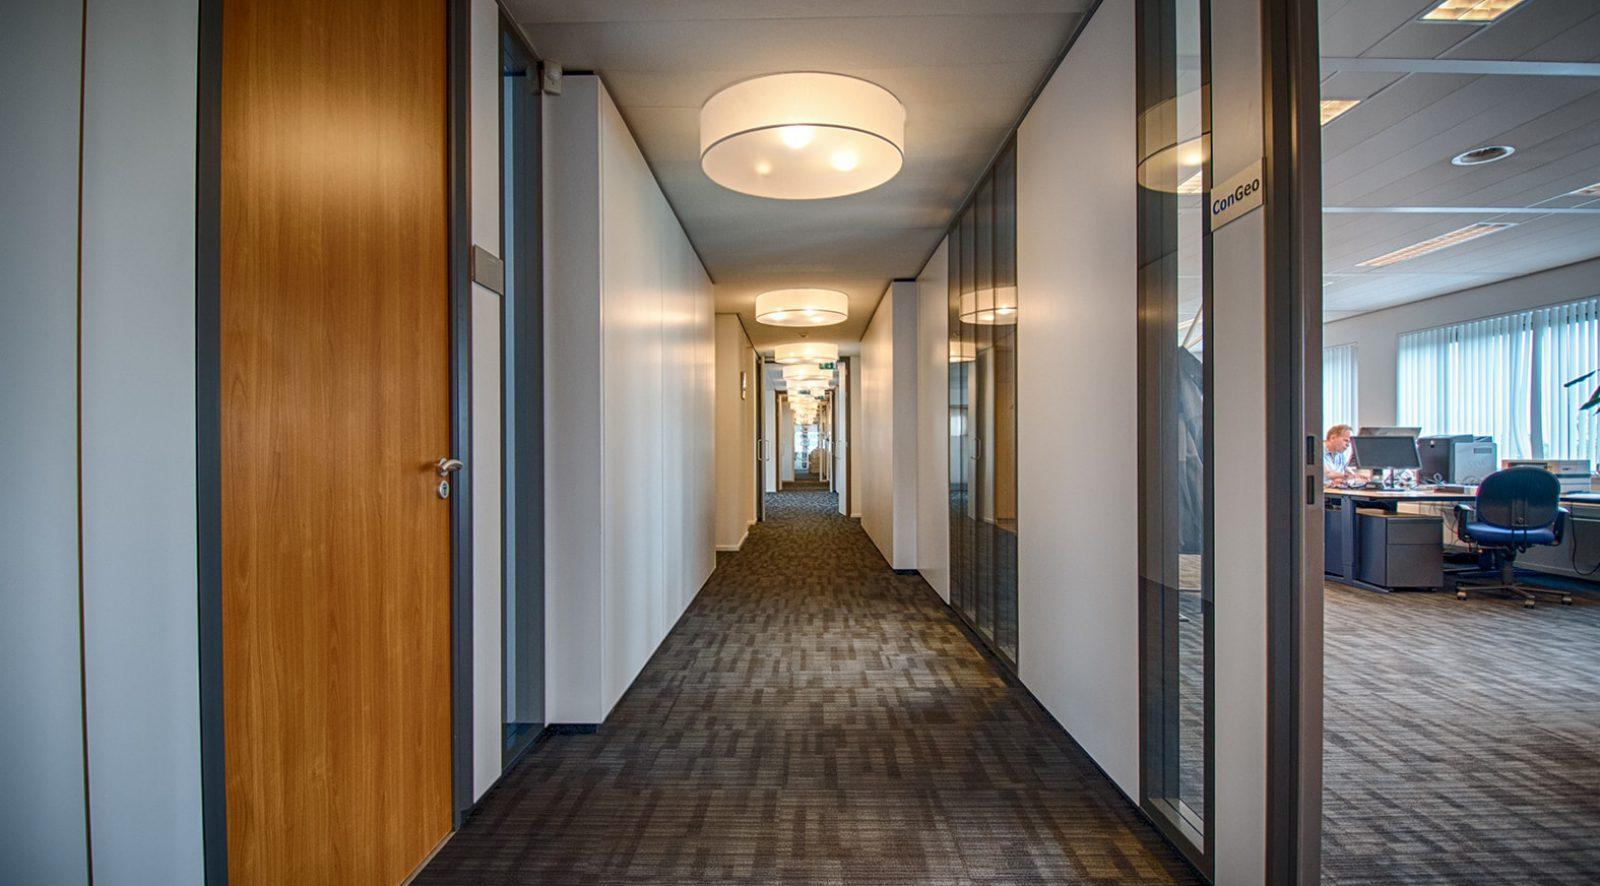 Kantoor huren in Bodegraven | Crown Business Center Bodegraven